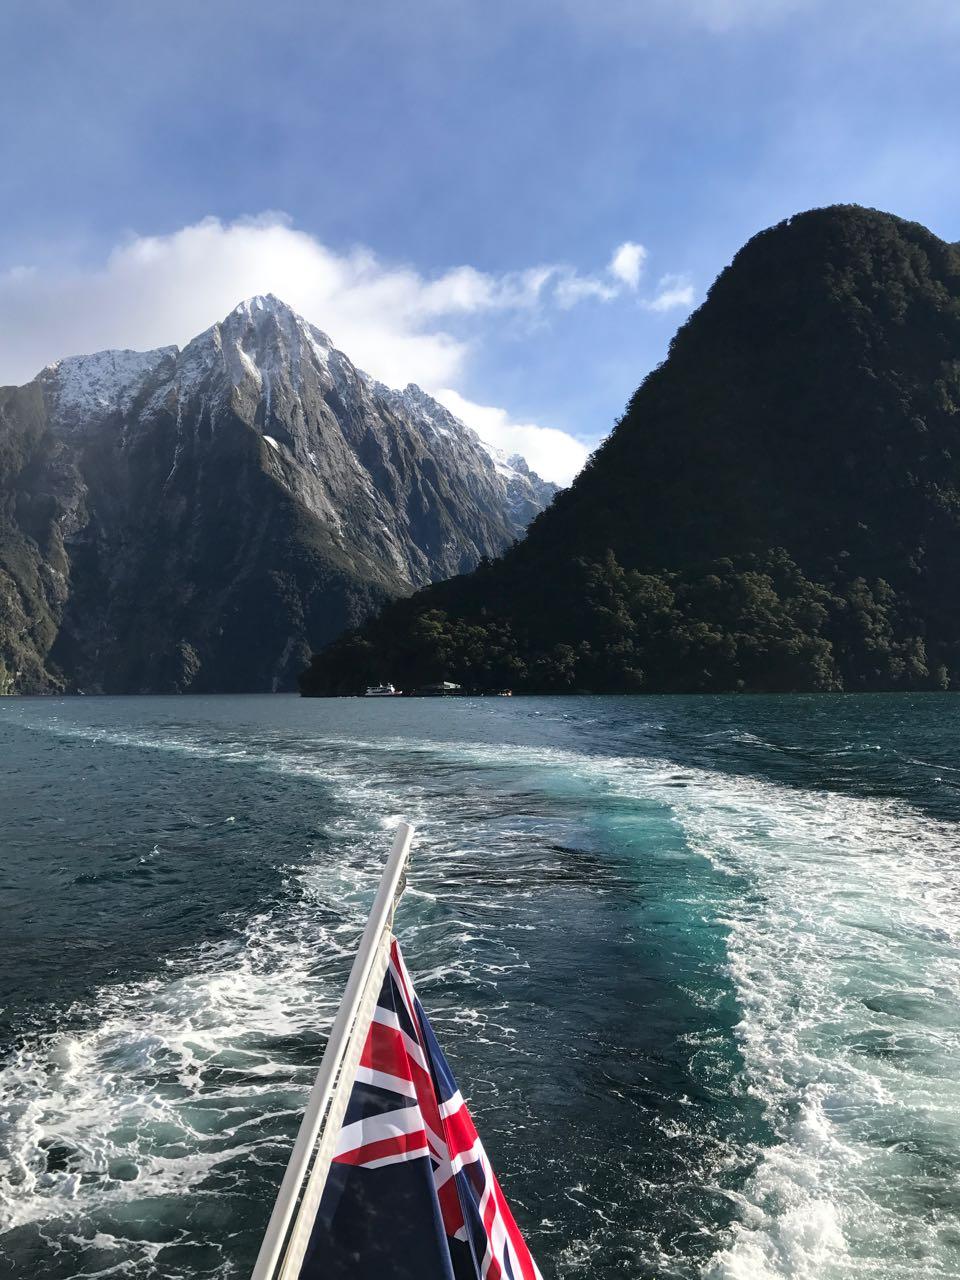 Milford Sound by boat.jpg